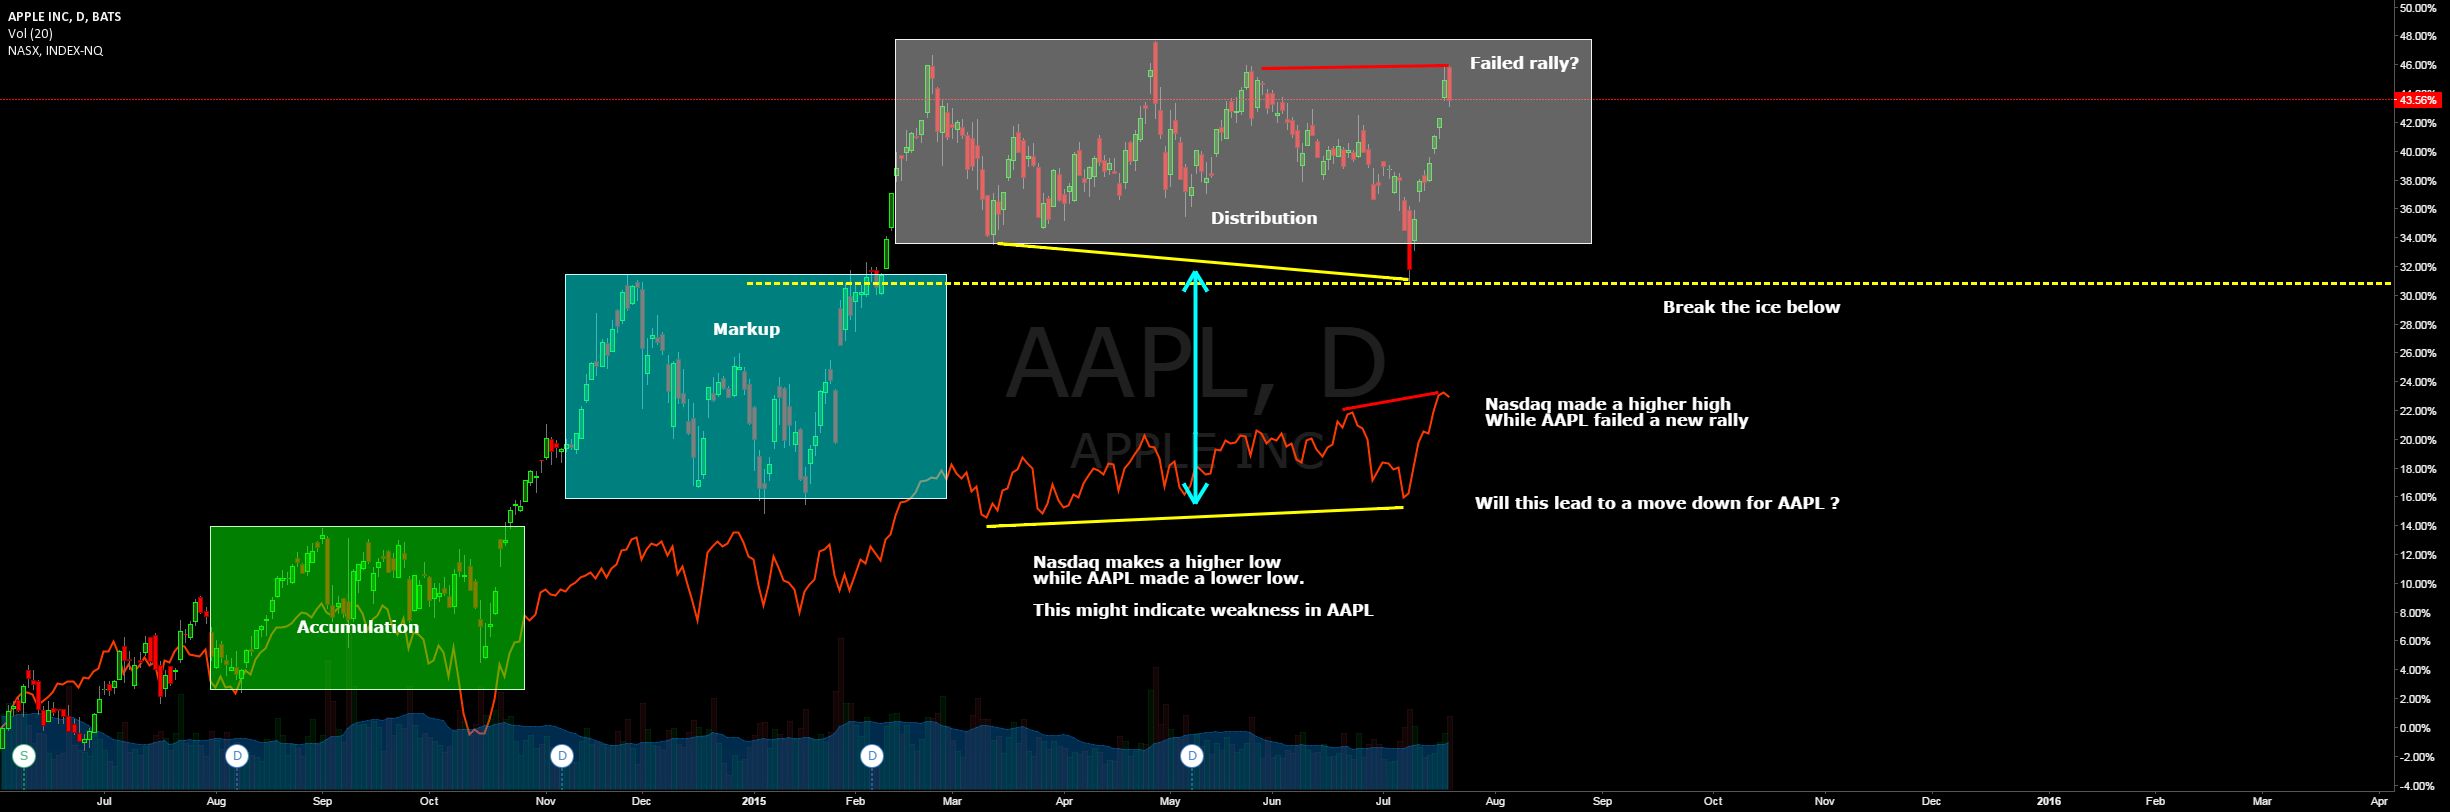 AAPL showing weakness